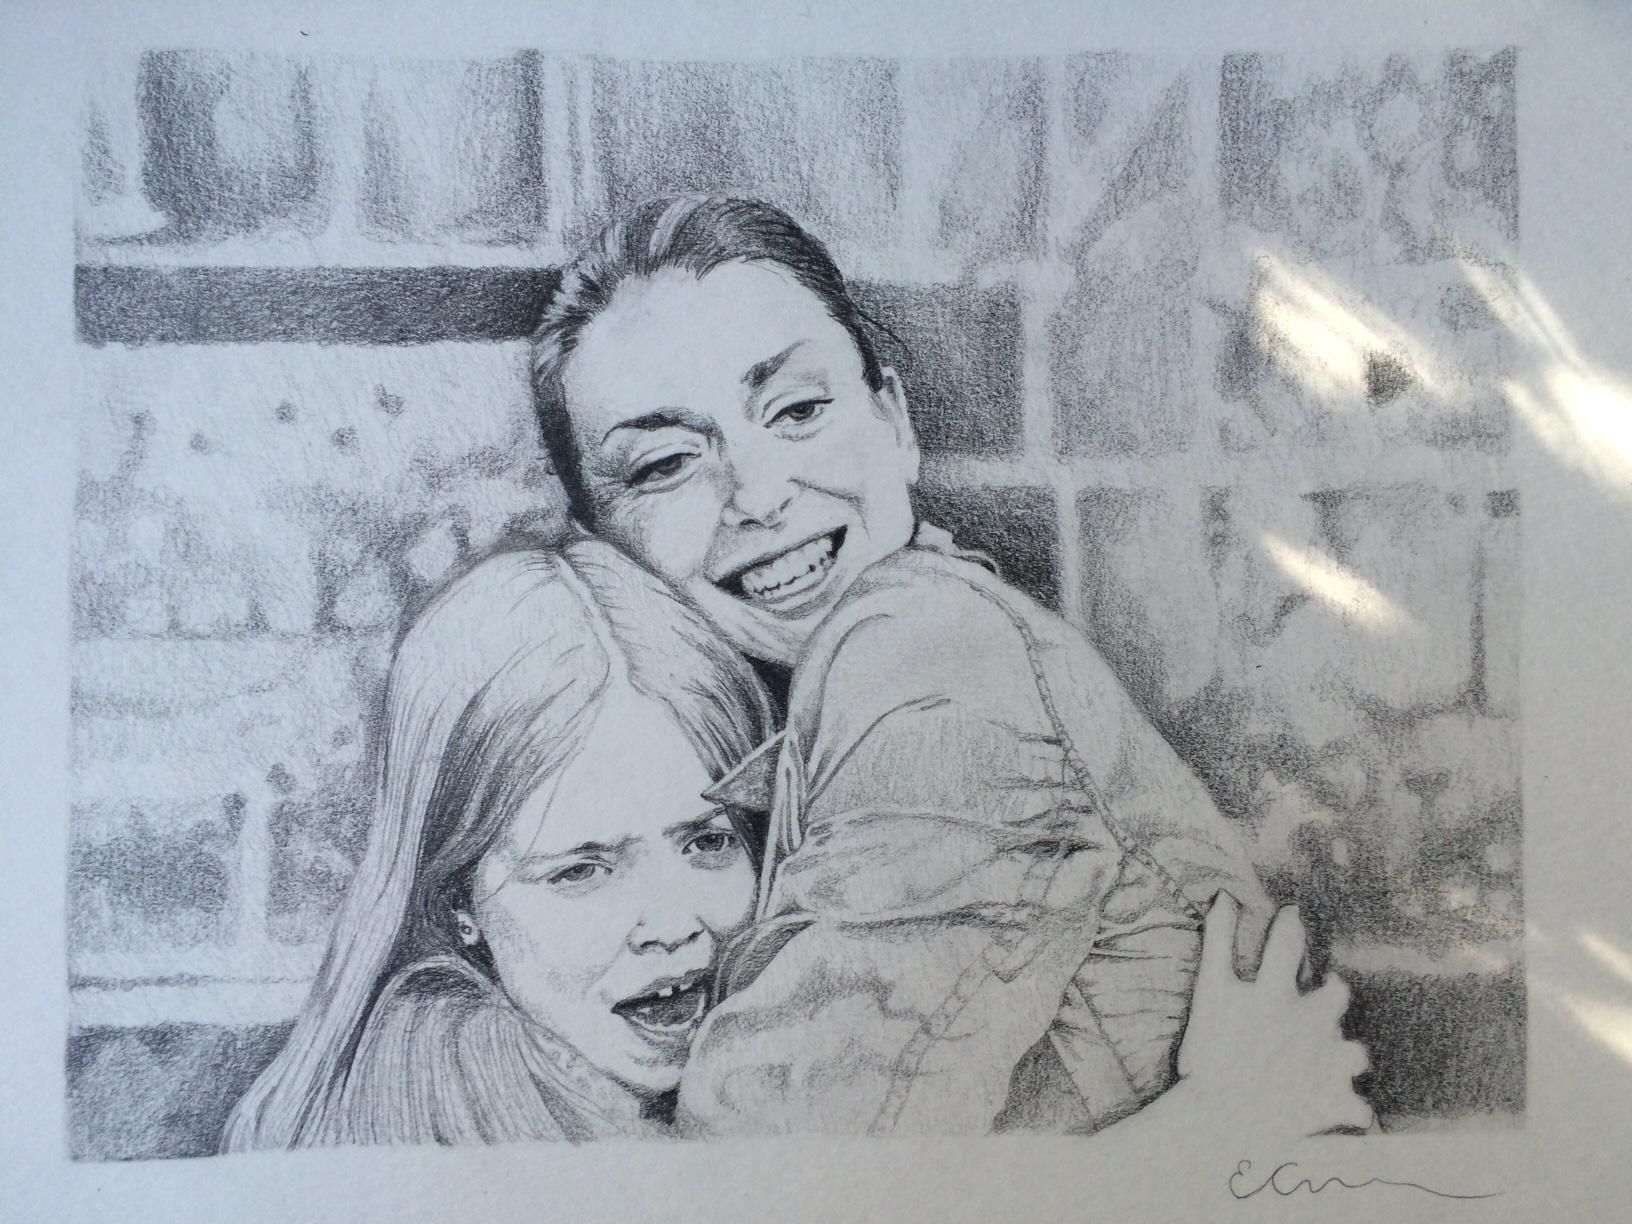 The finished illustration....